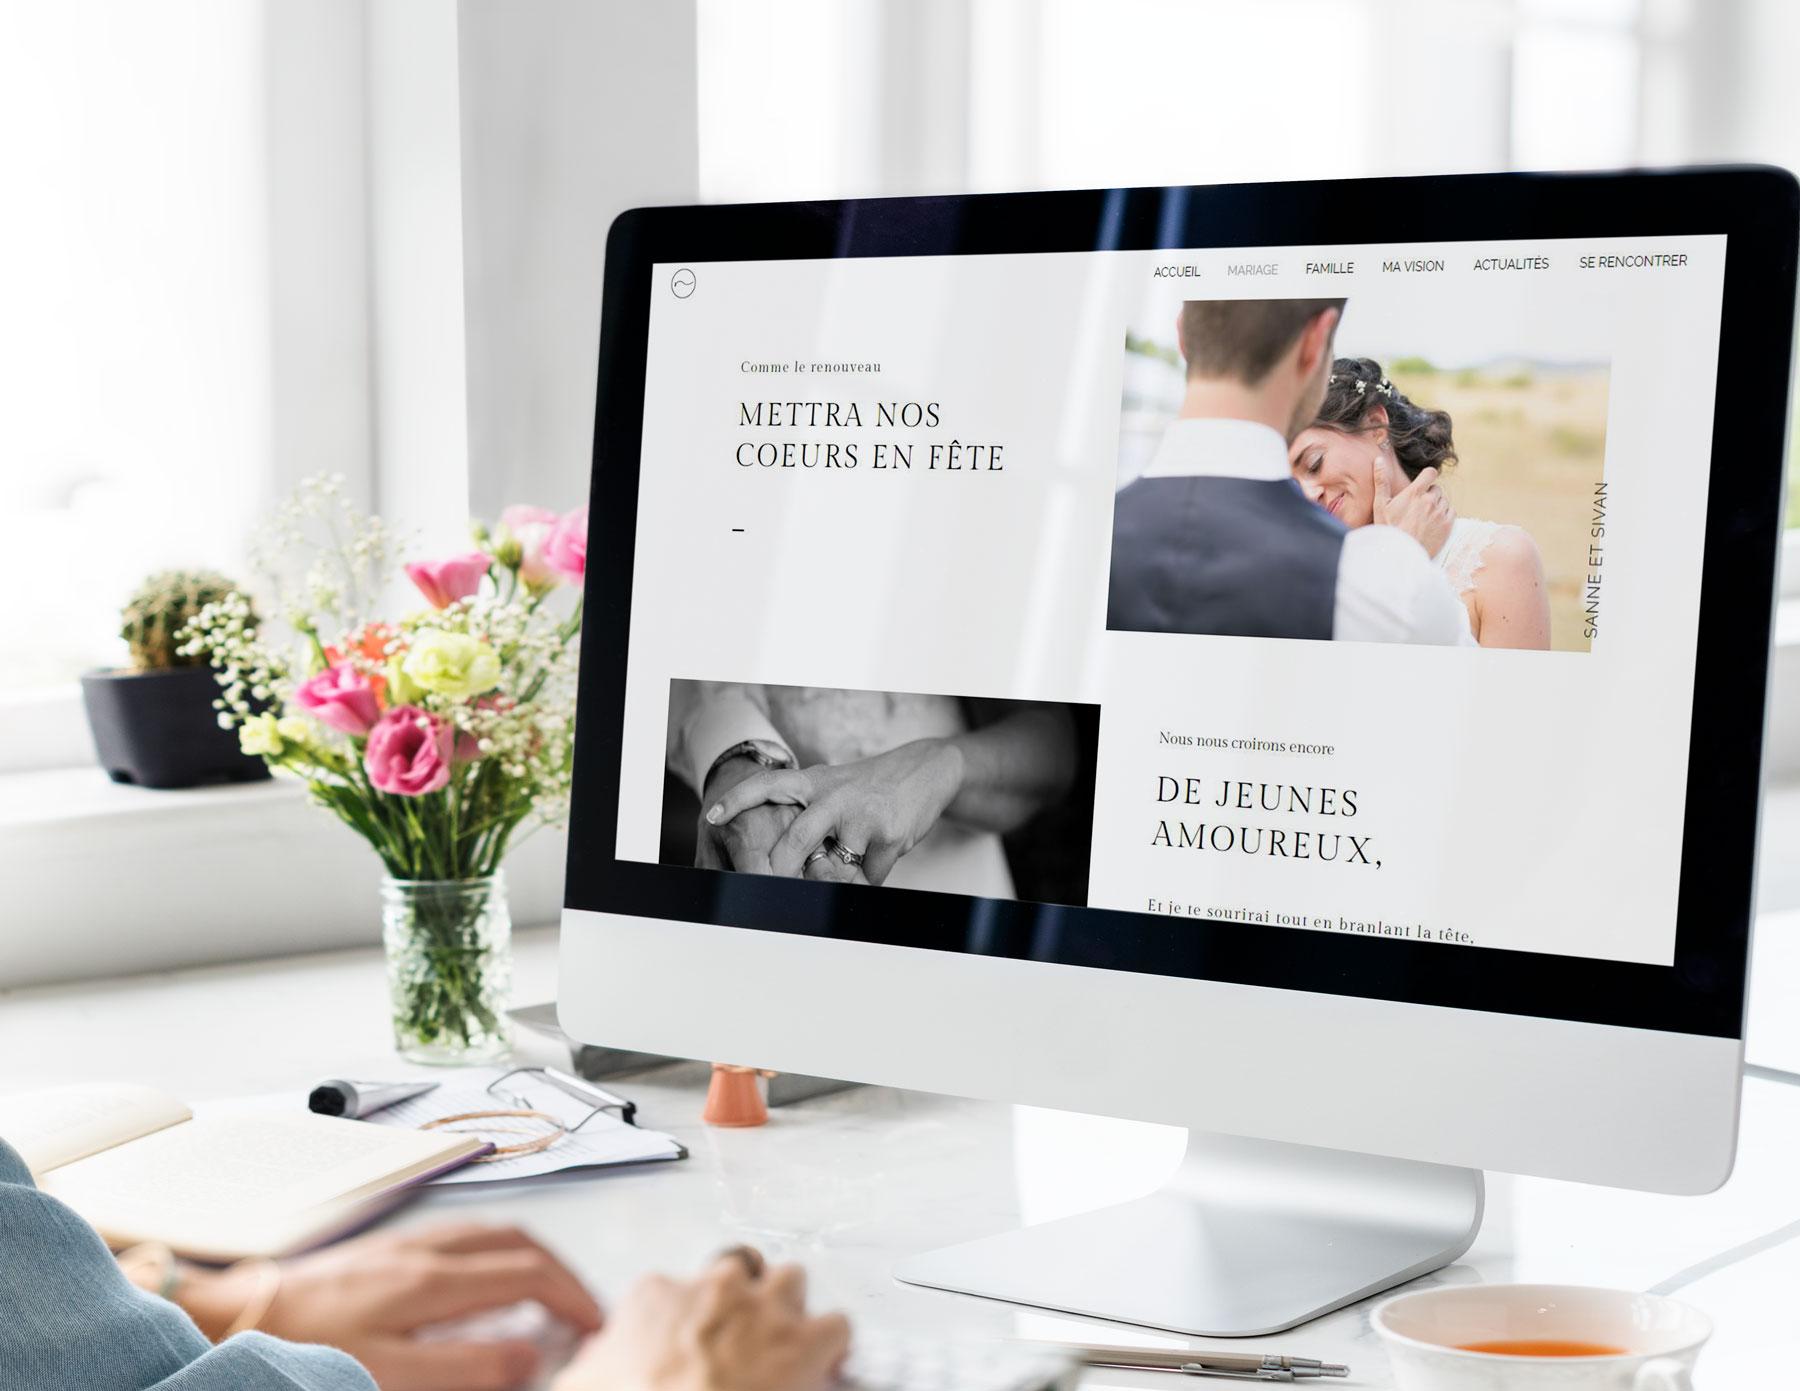 Aurelie Ferrer site web photographe